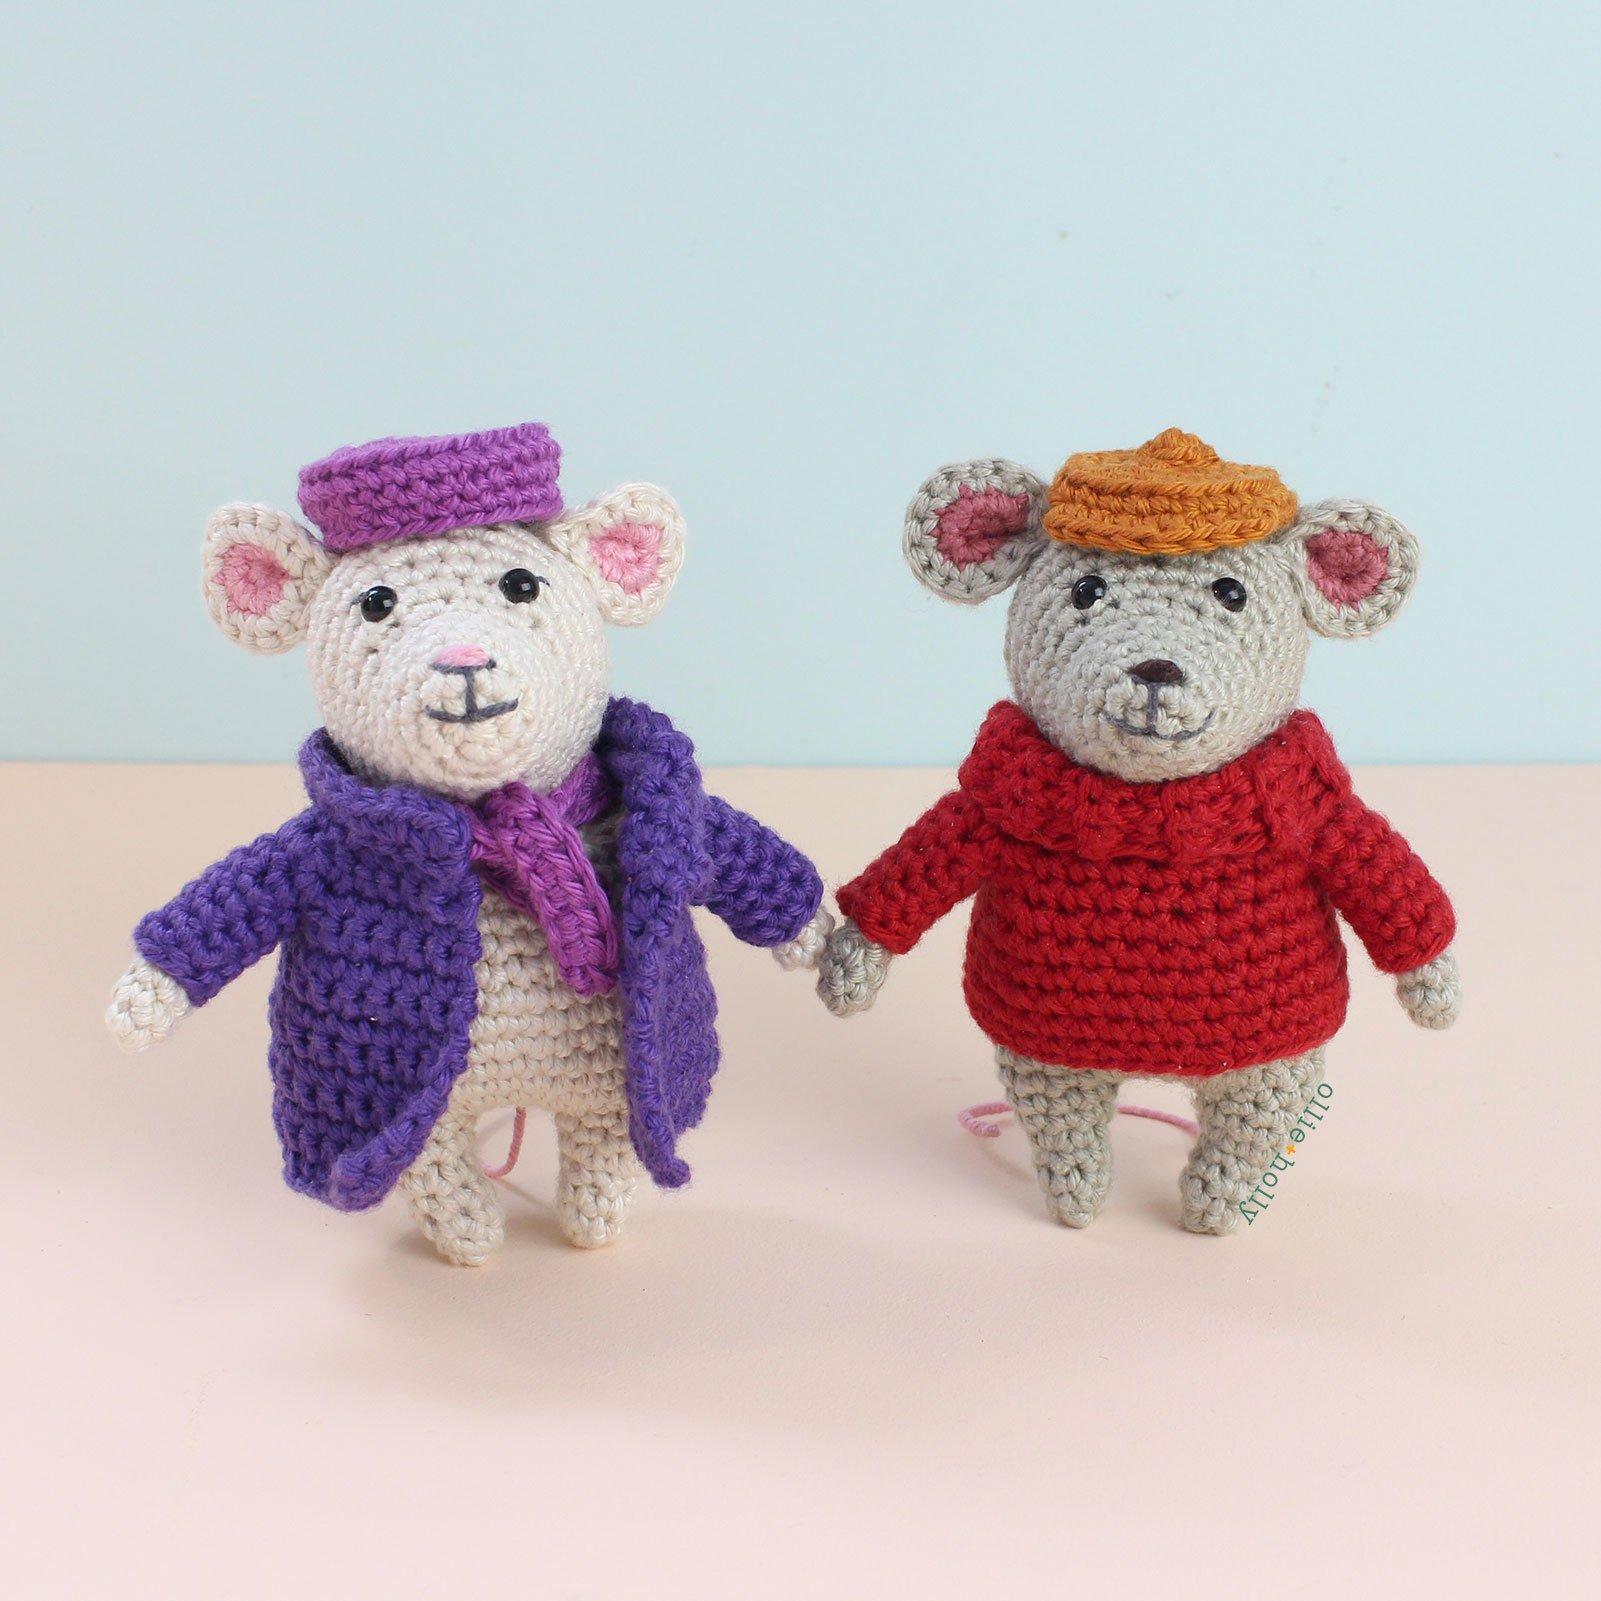 Amigurumi Valentine Heart Cat Crochet Free Patterns - Crochet ... | 1601x1601